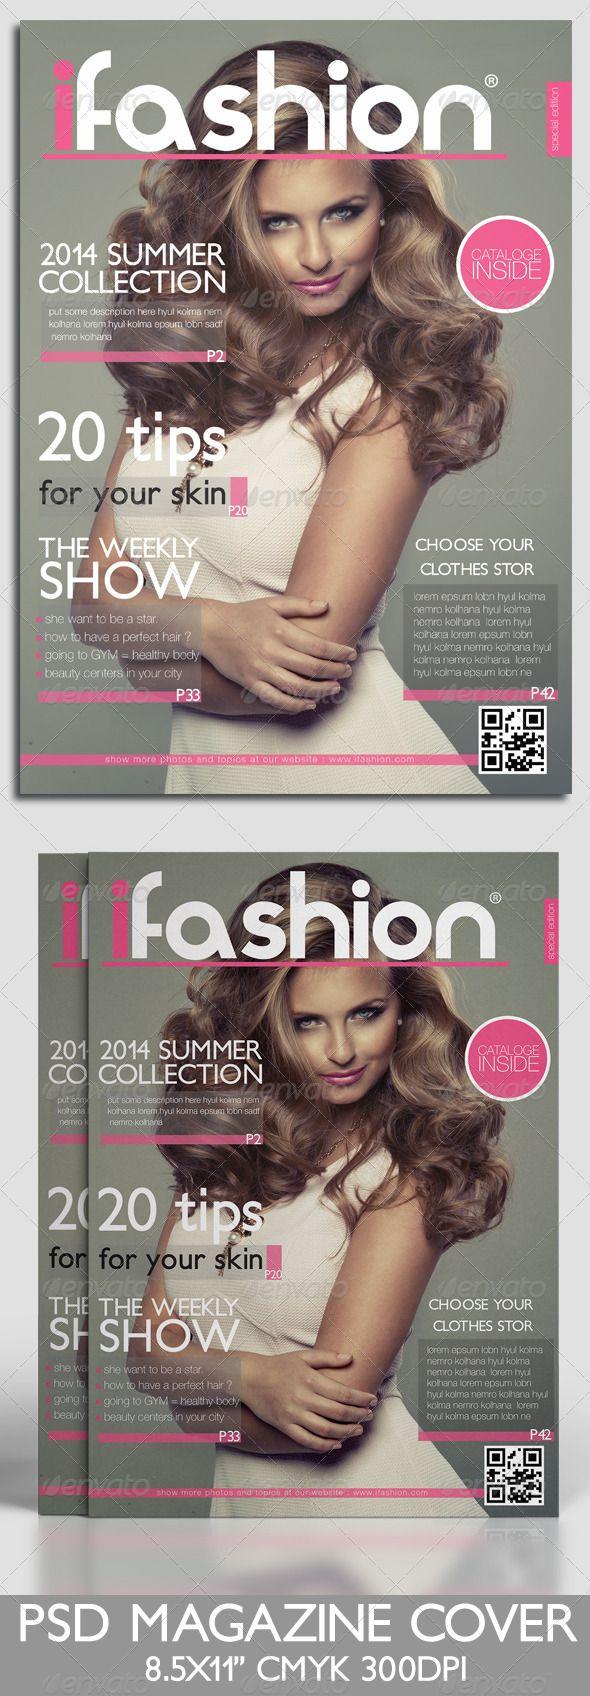 Magazine Cover Template | Magazine cover template, Magazine covers ...